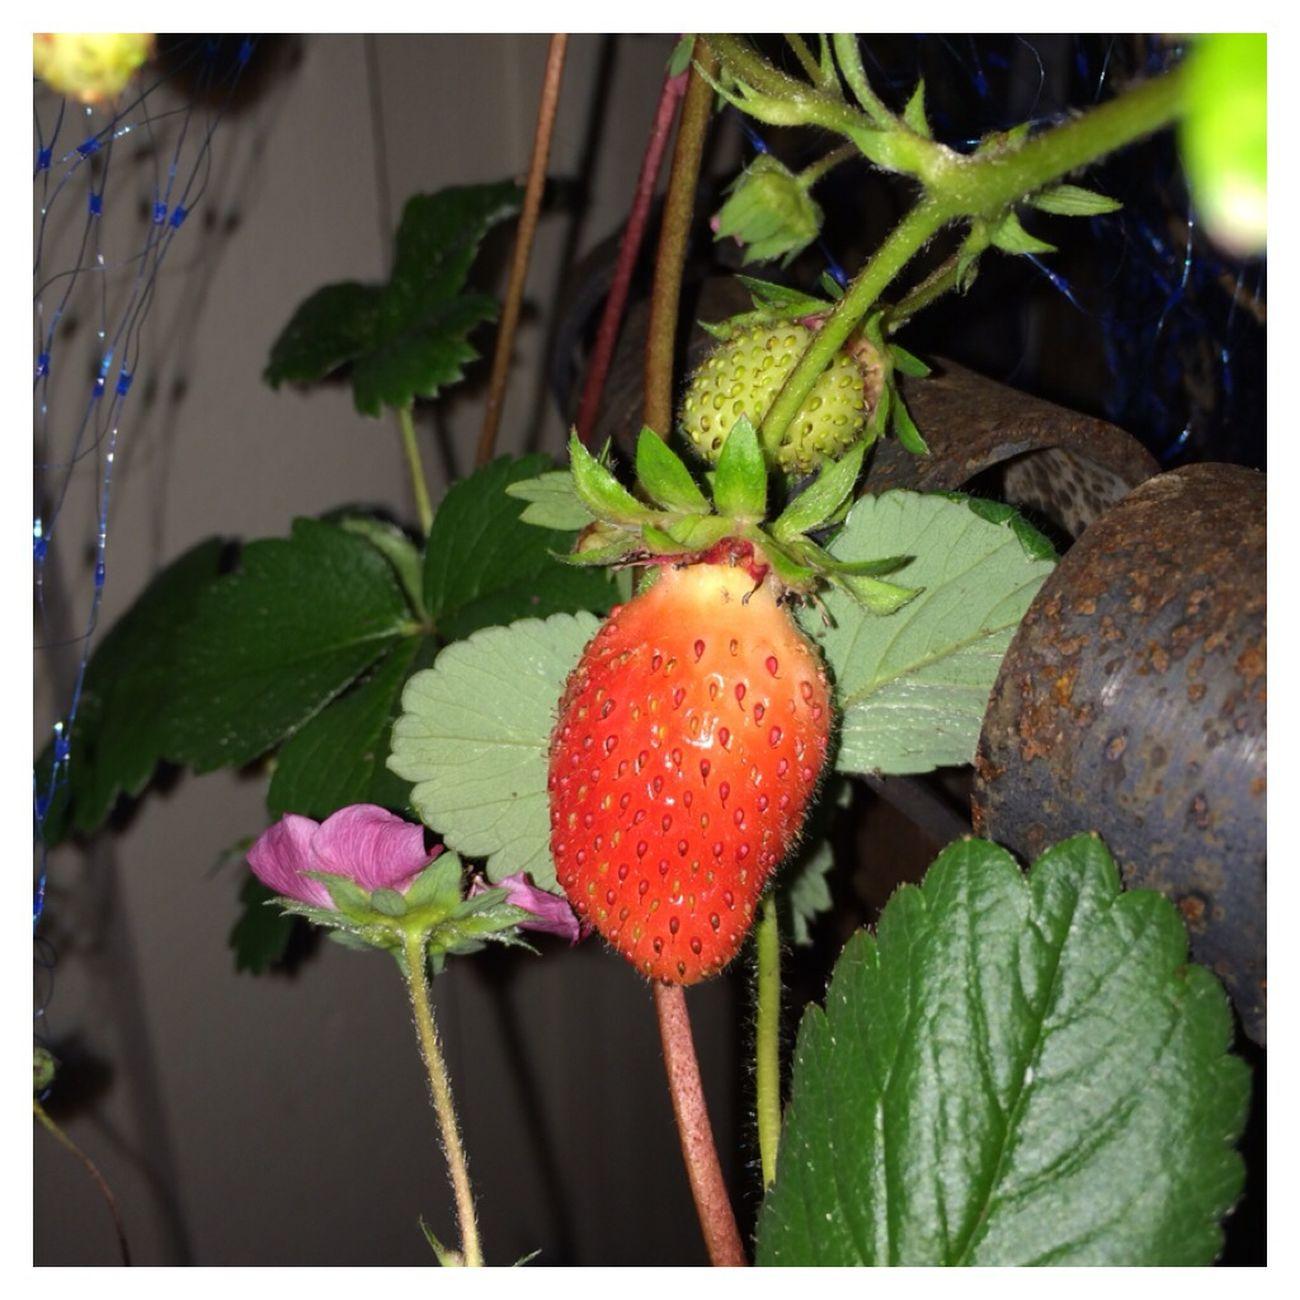 Strawberry Urban Gardening Summer Ecologic